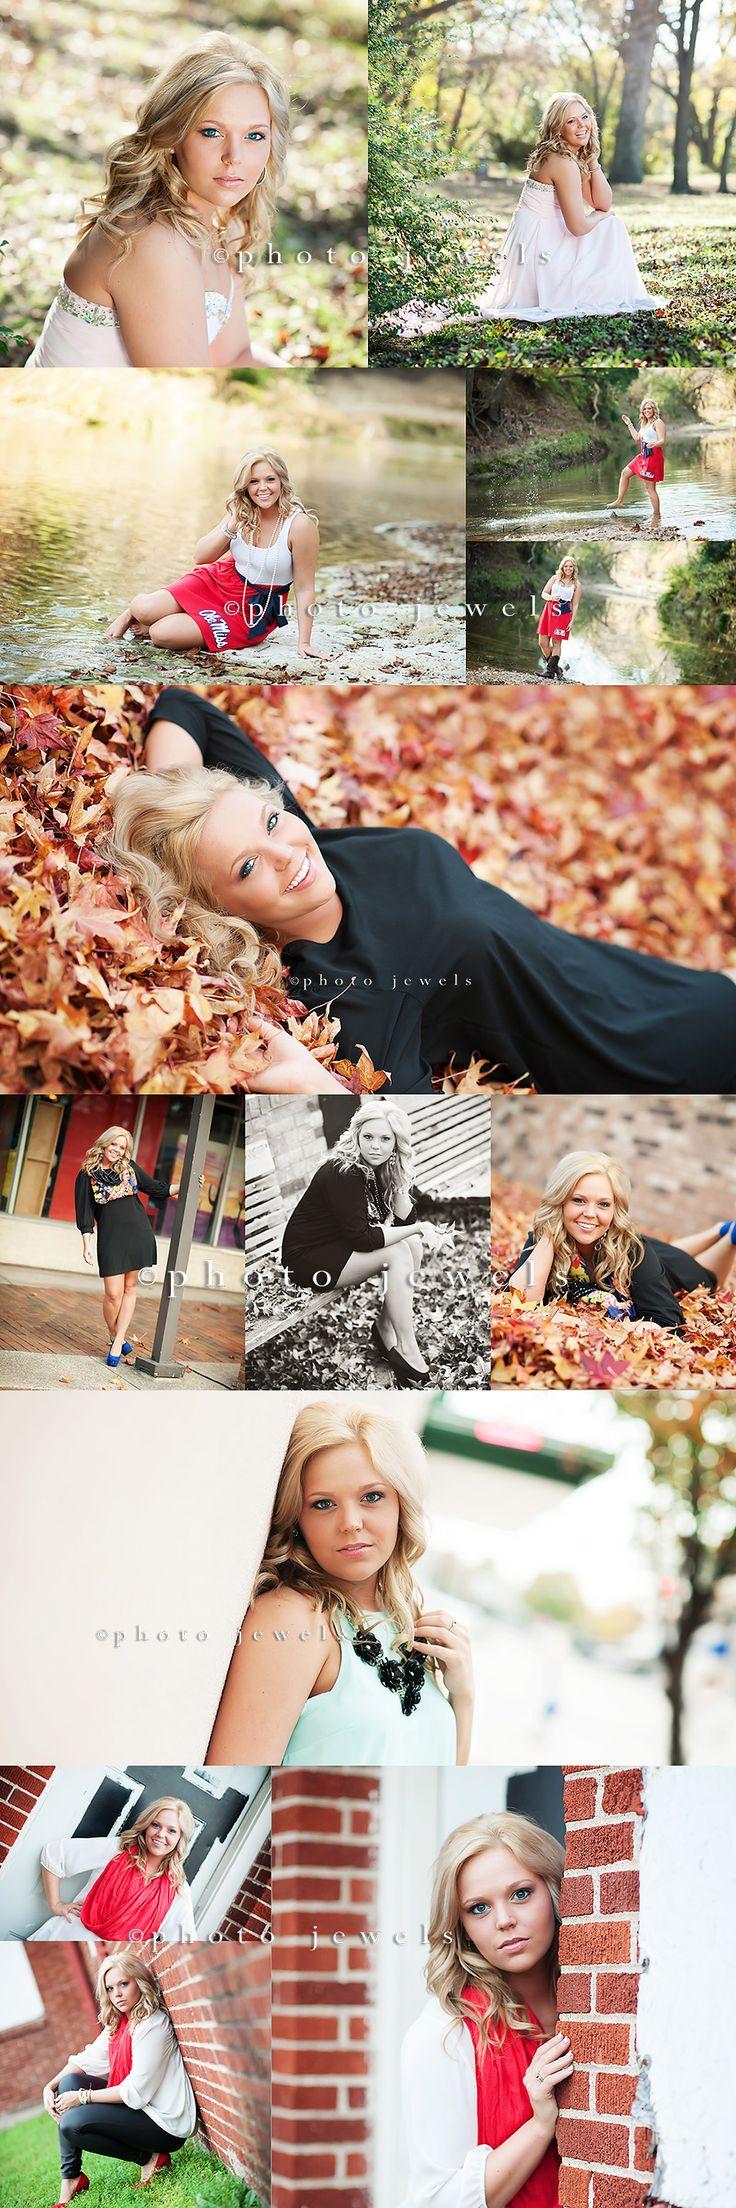 senior girl, senior photos, senior pics, senior pictures, senior 2014, photo jewels